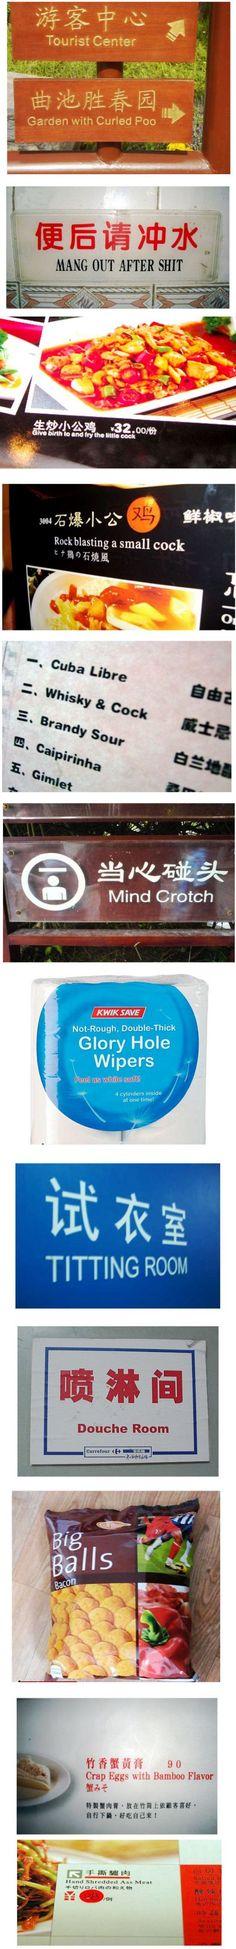 translation failure level: epic